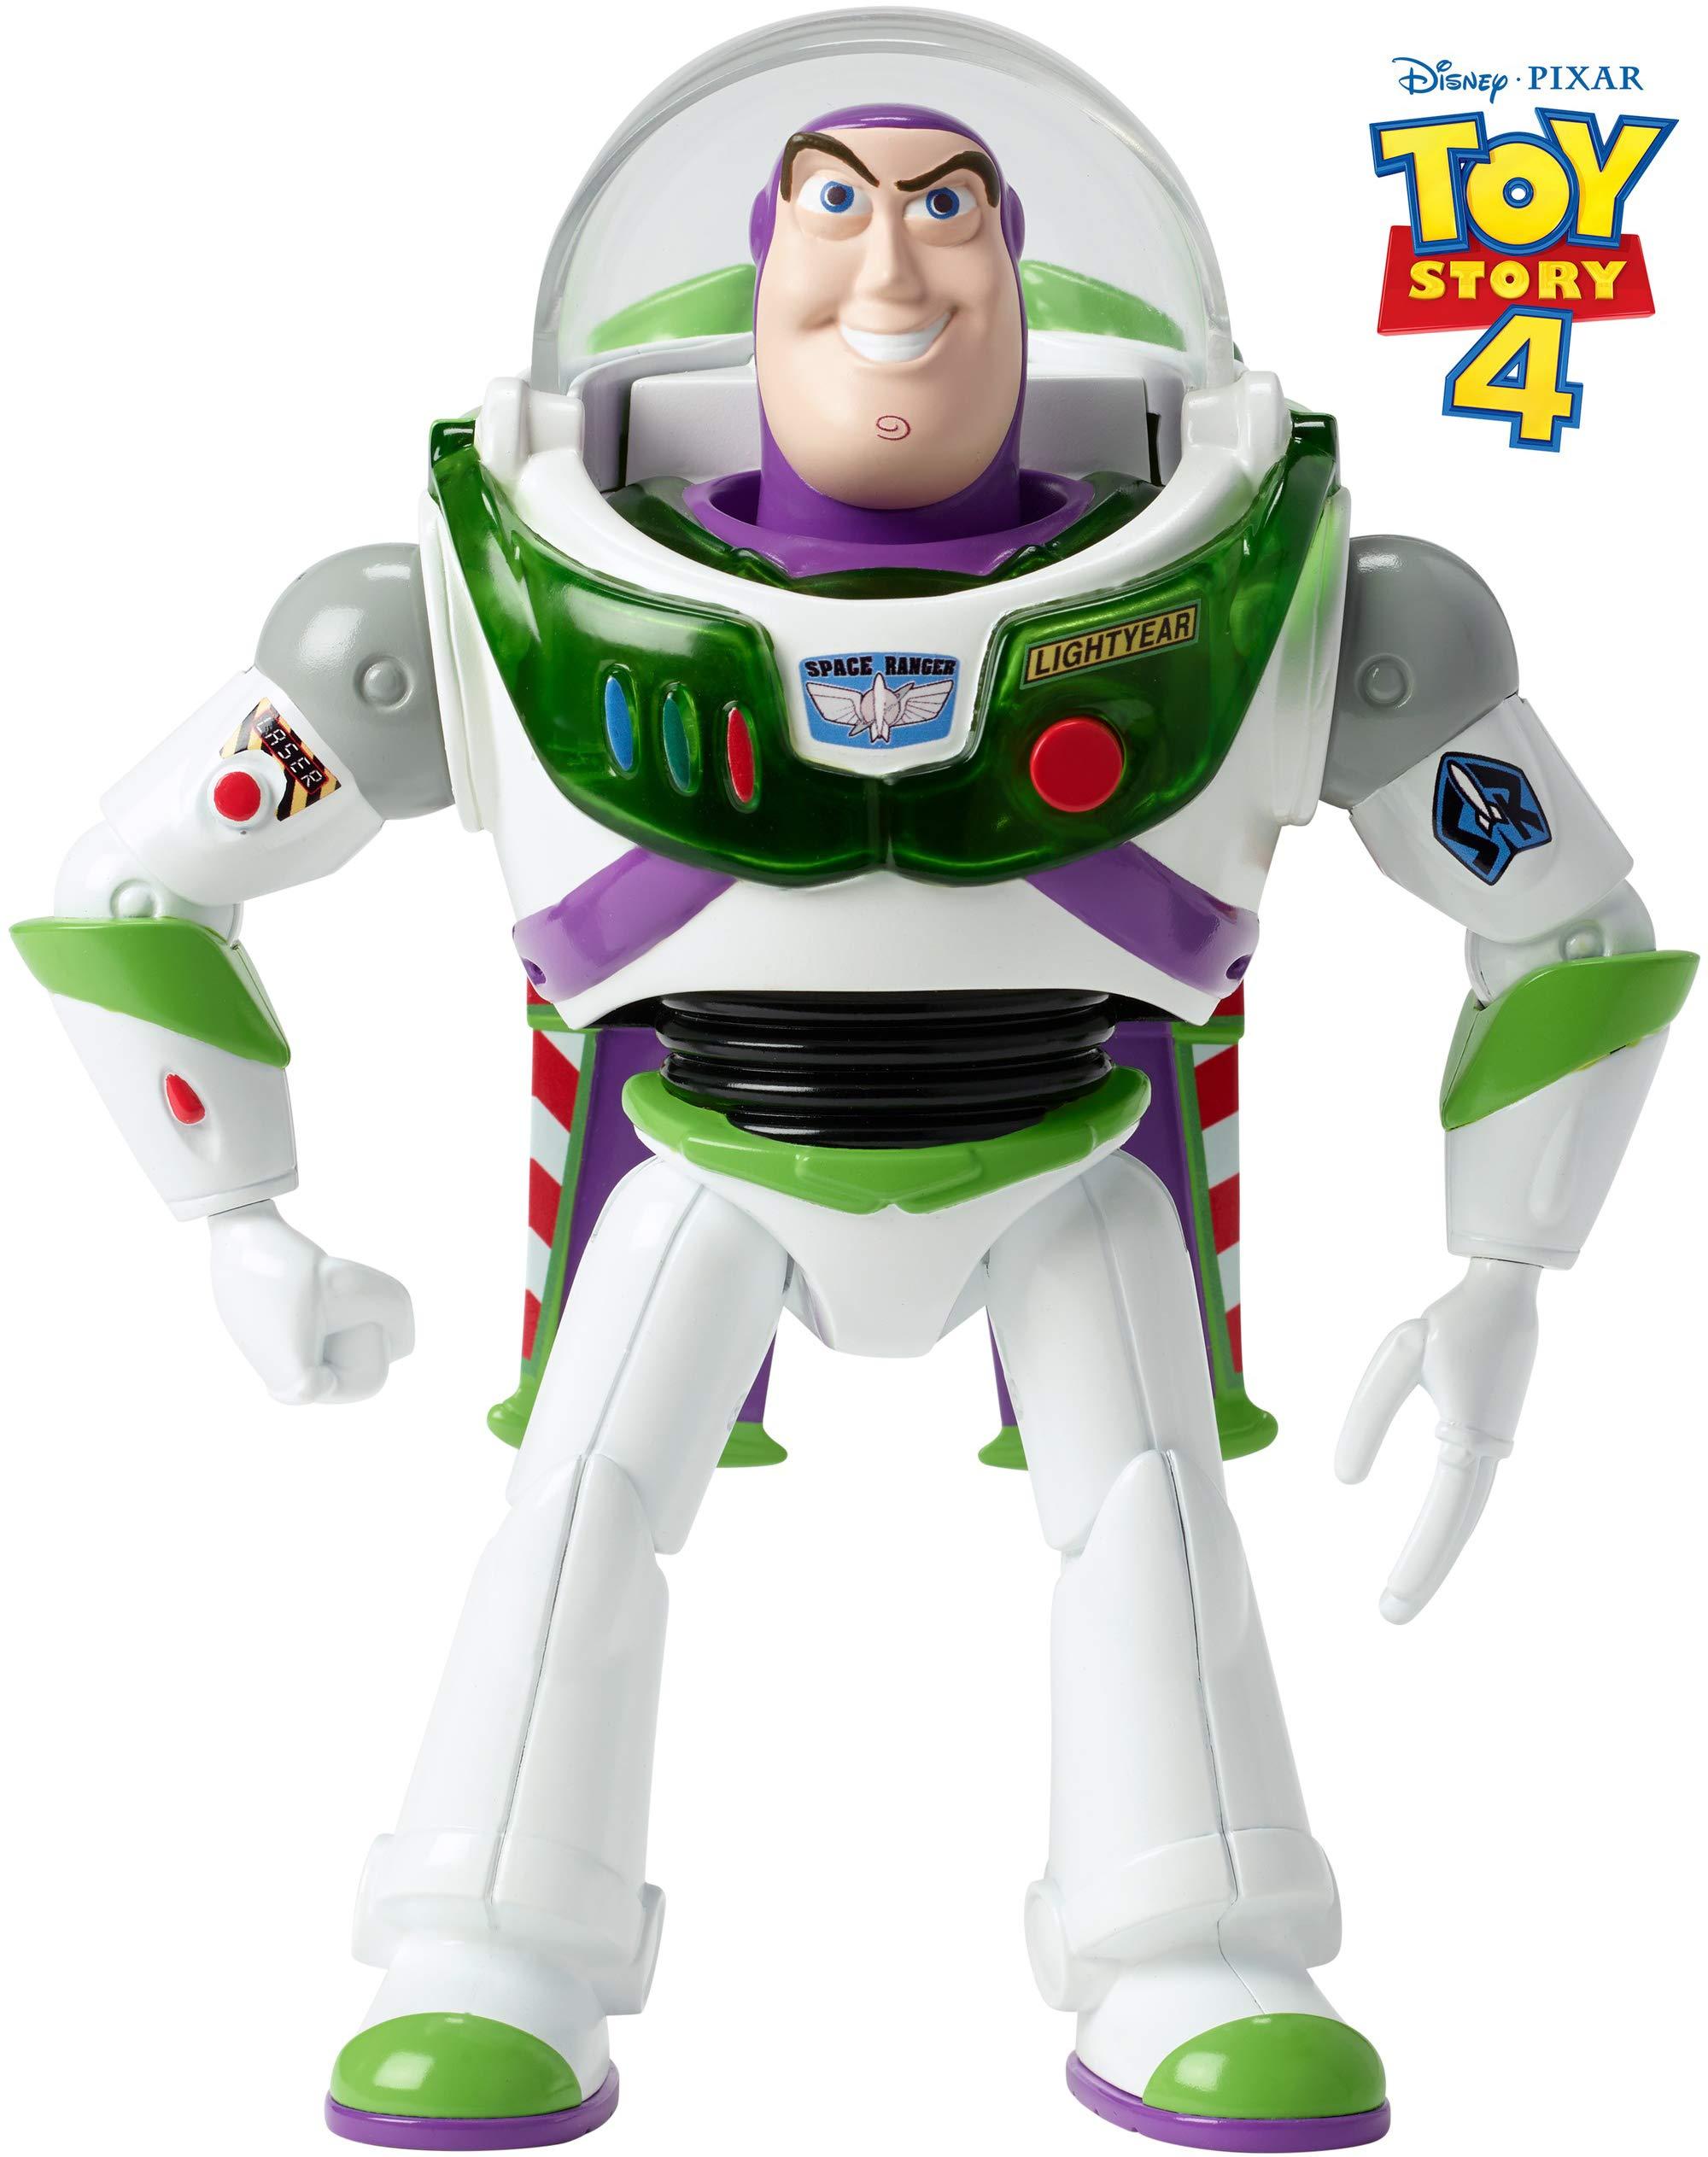 "ویکالا · خرید  اصل اورجینال · خرید از آمازون · Disney Pixar Toy Story Blast-Off Buzz Lightyear Figure, 7"" wekala · ویکالا"